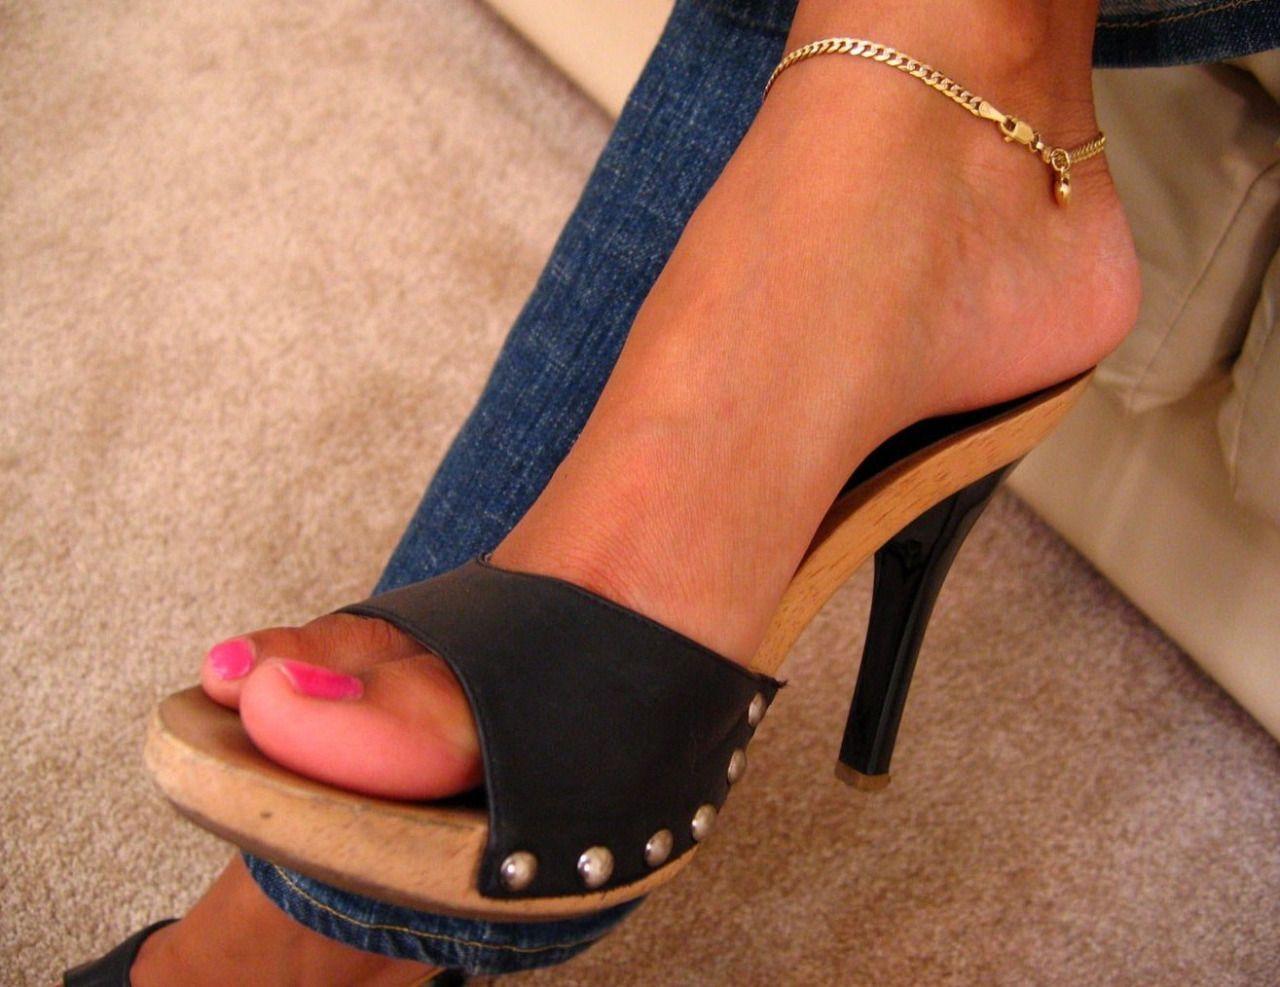 You porn high heels